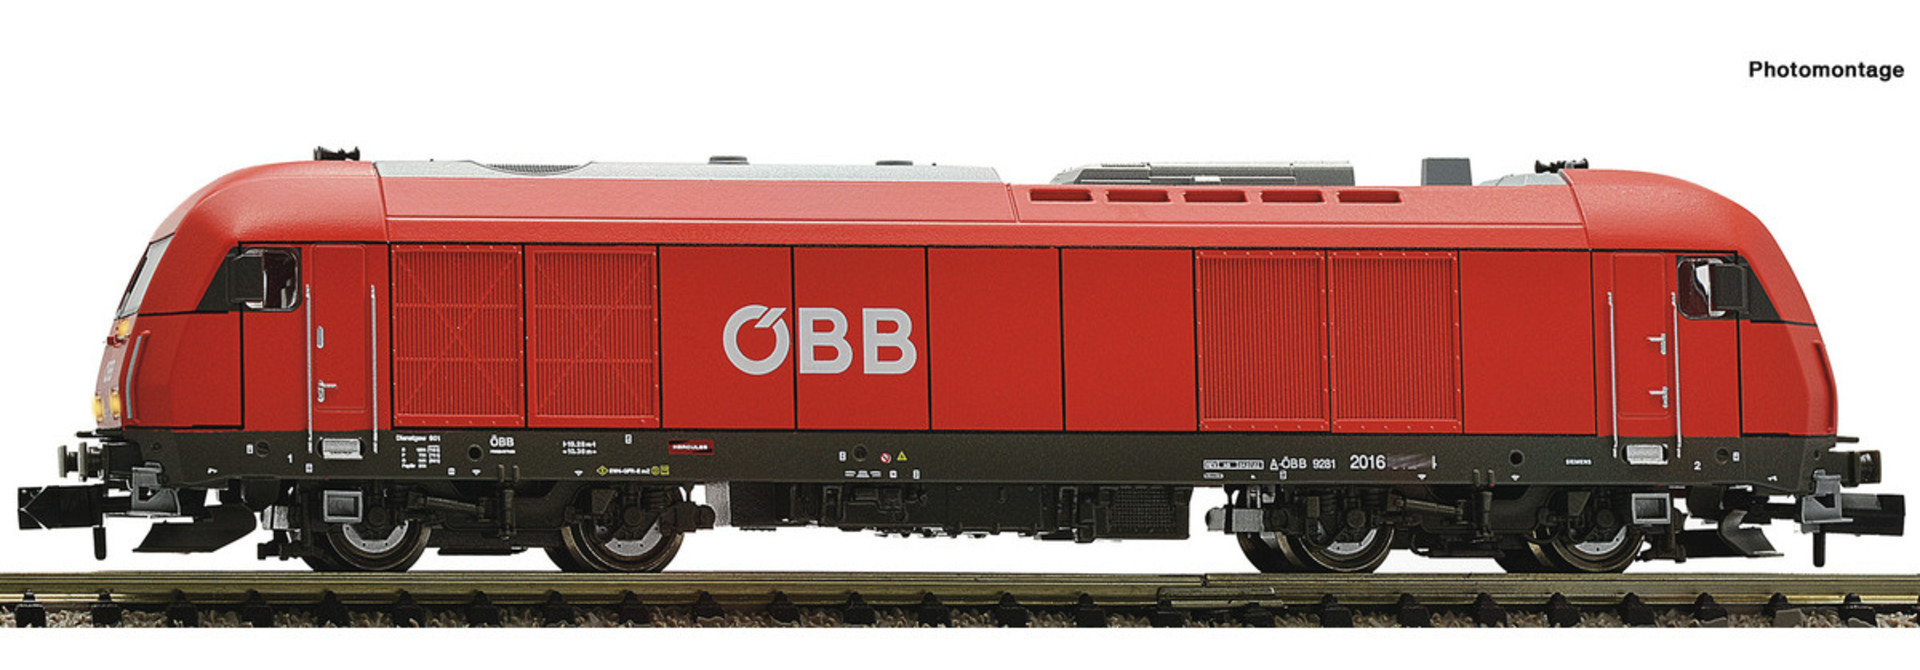 726019 Diesellok Rh 2016 ÖBB